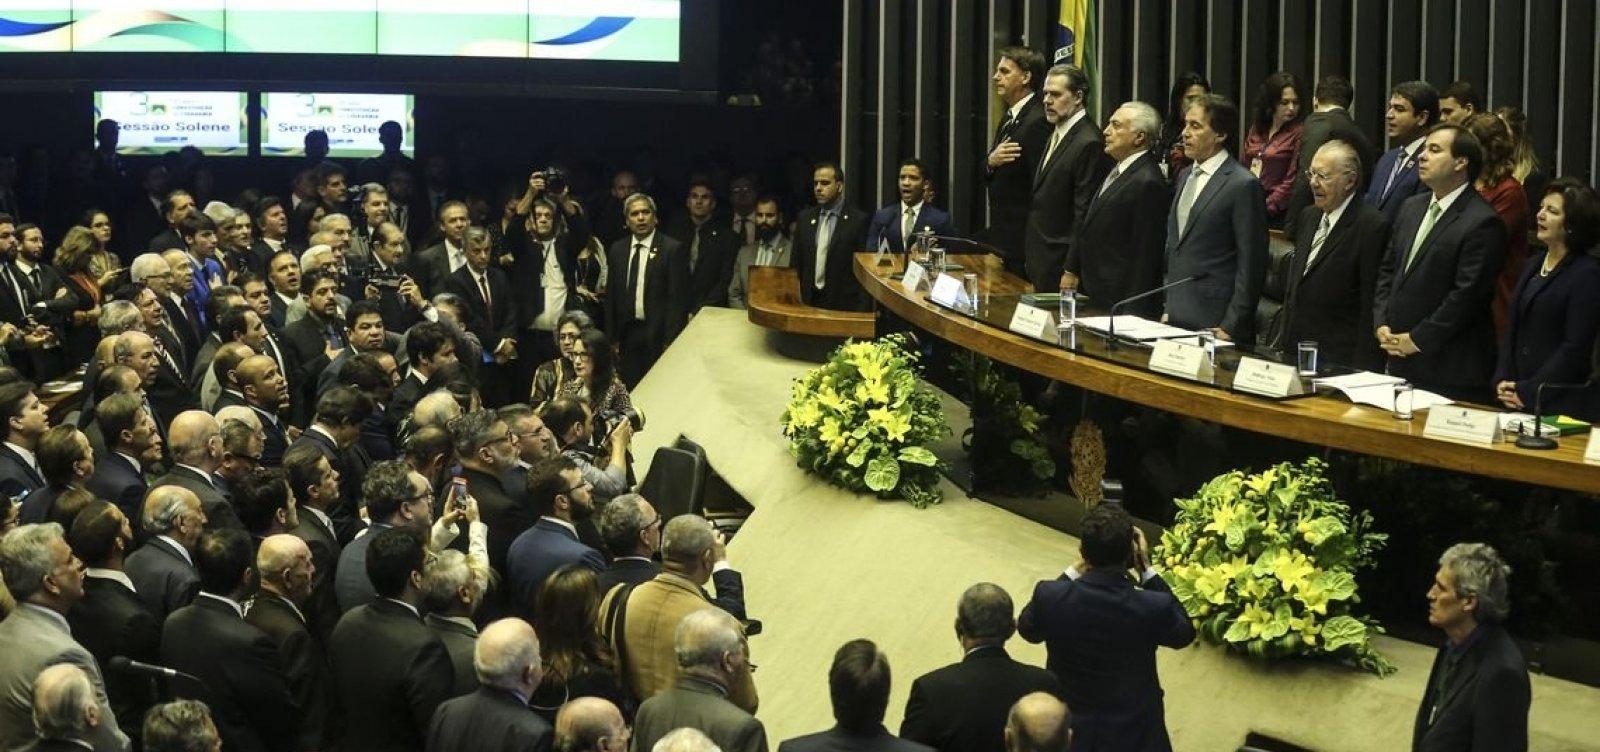 [Congresso vai deixar rombo de R$ 259 bi para Bolsonaro]